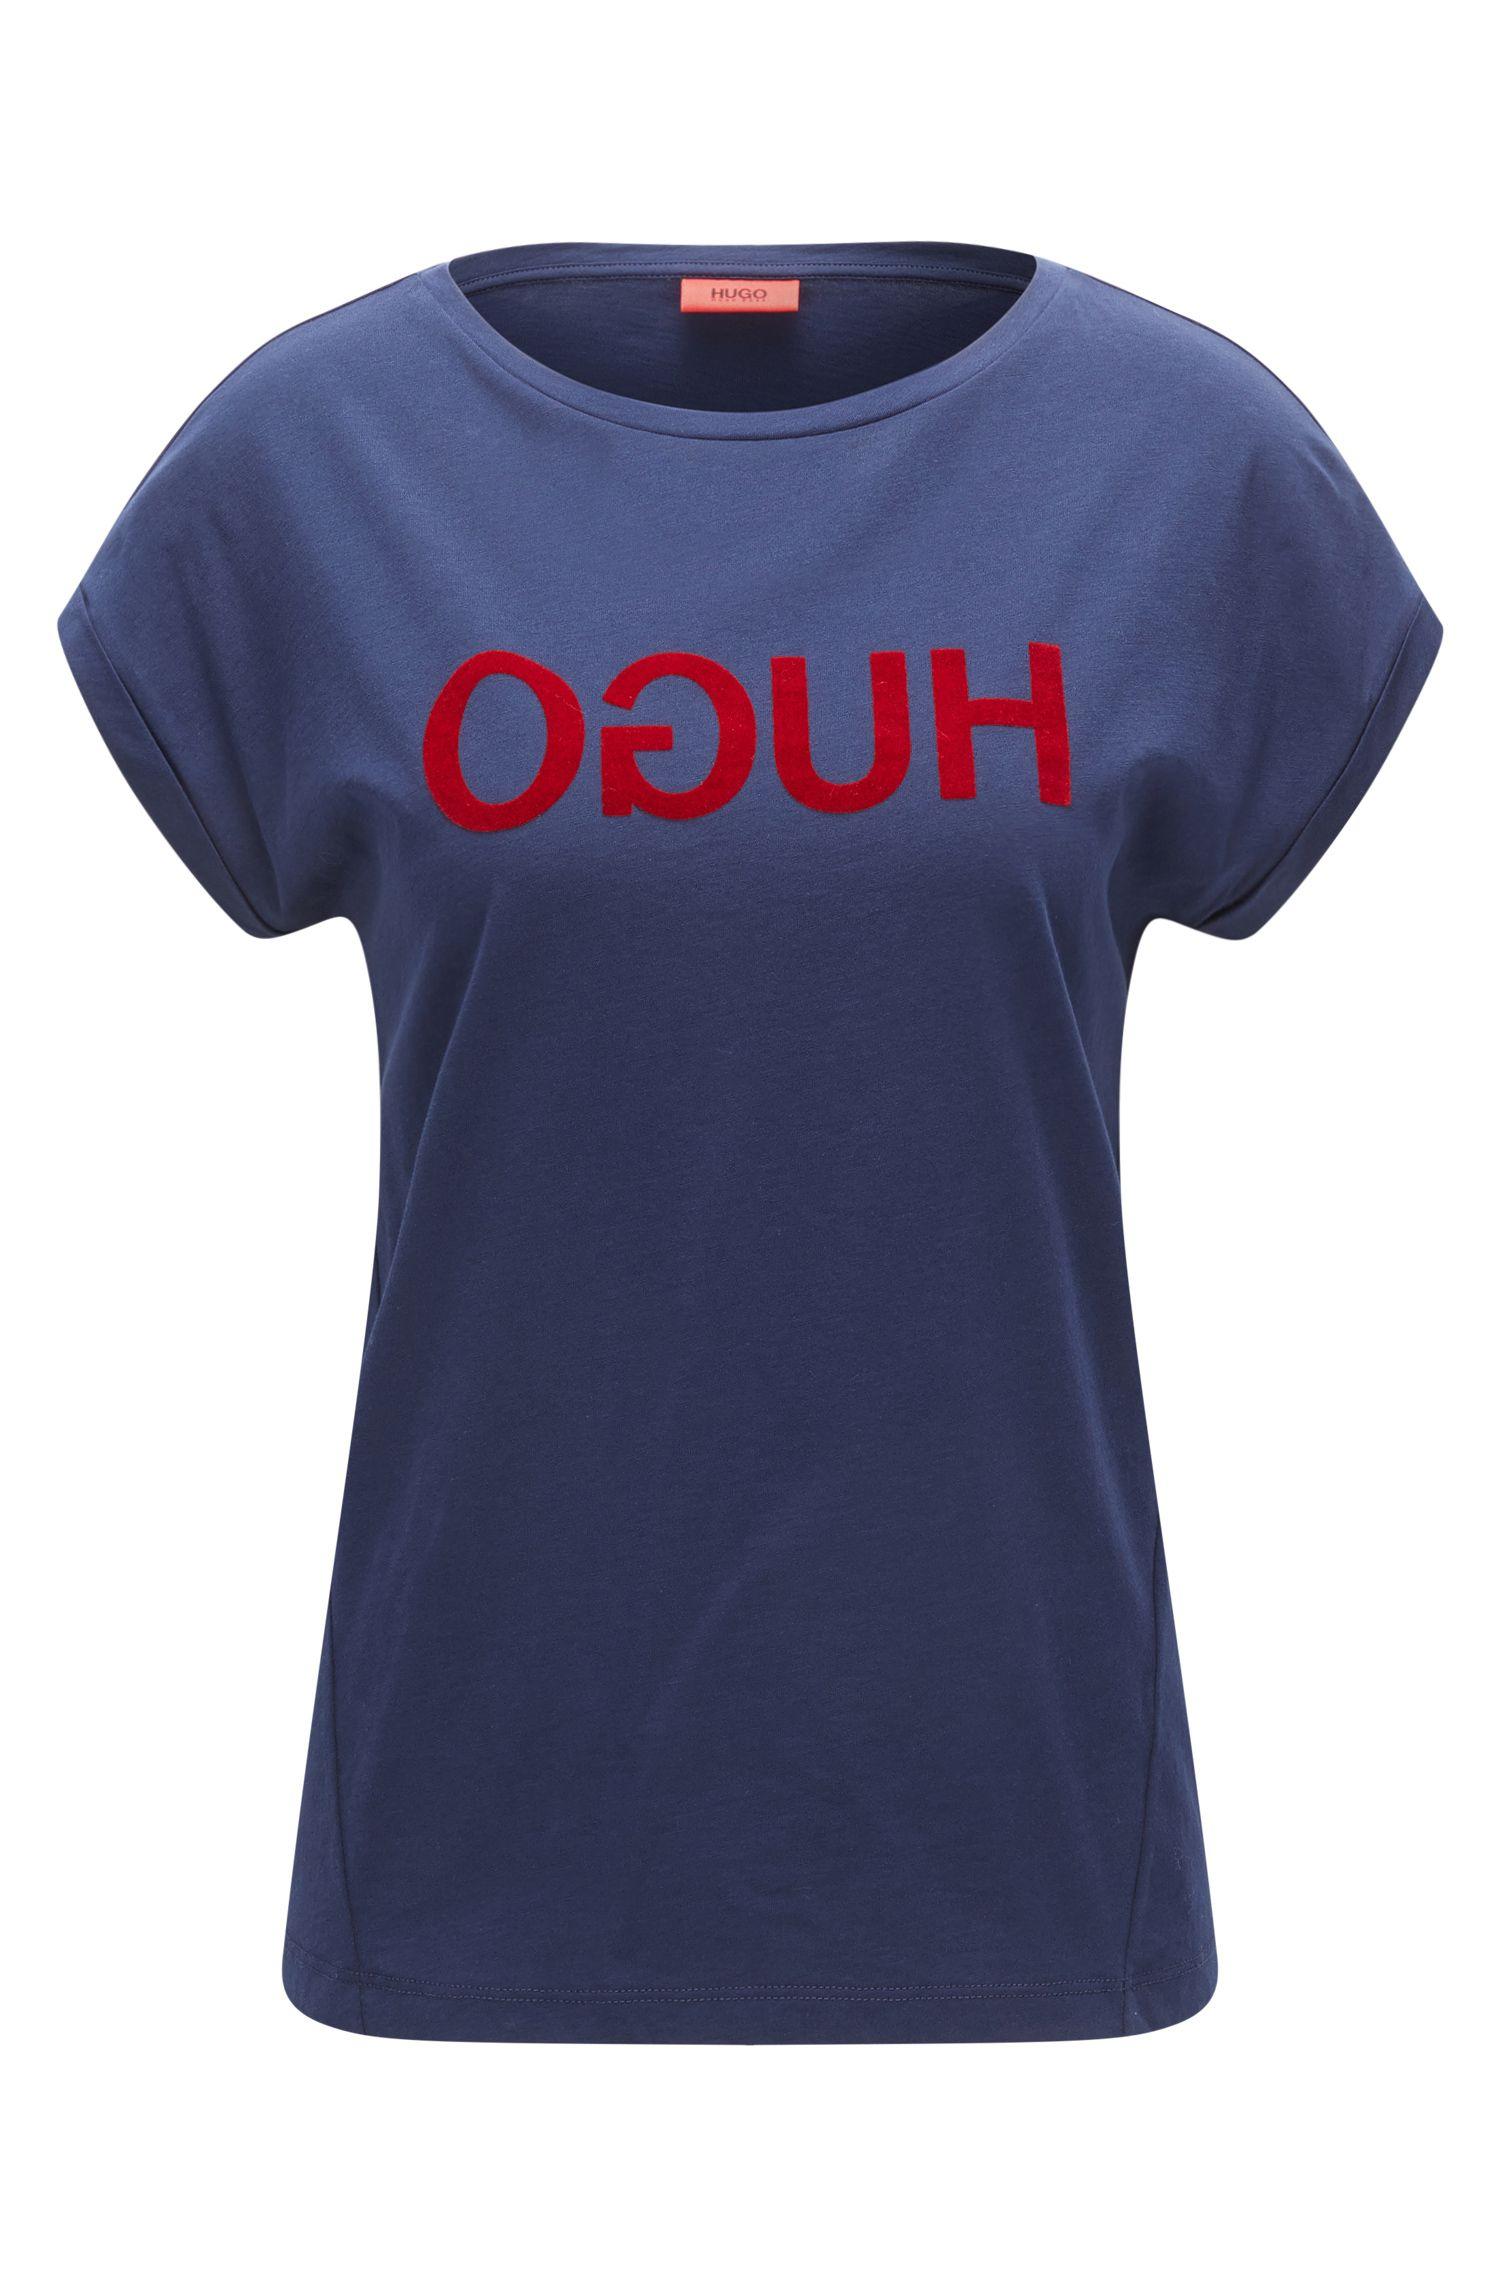 T-shirt relaxed fit in jersey di cotone con logo a rovescio